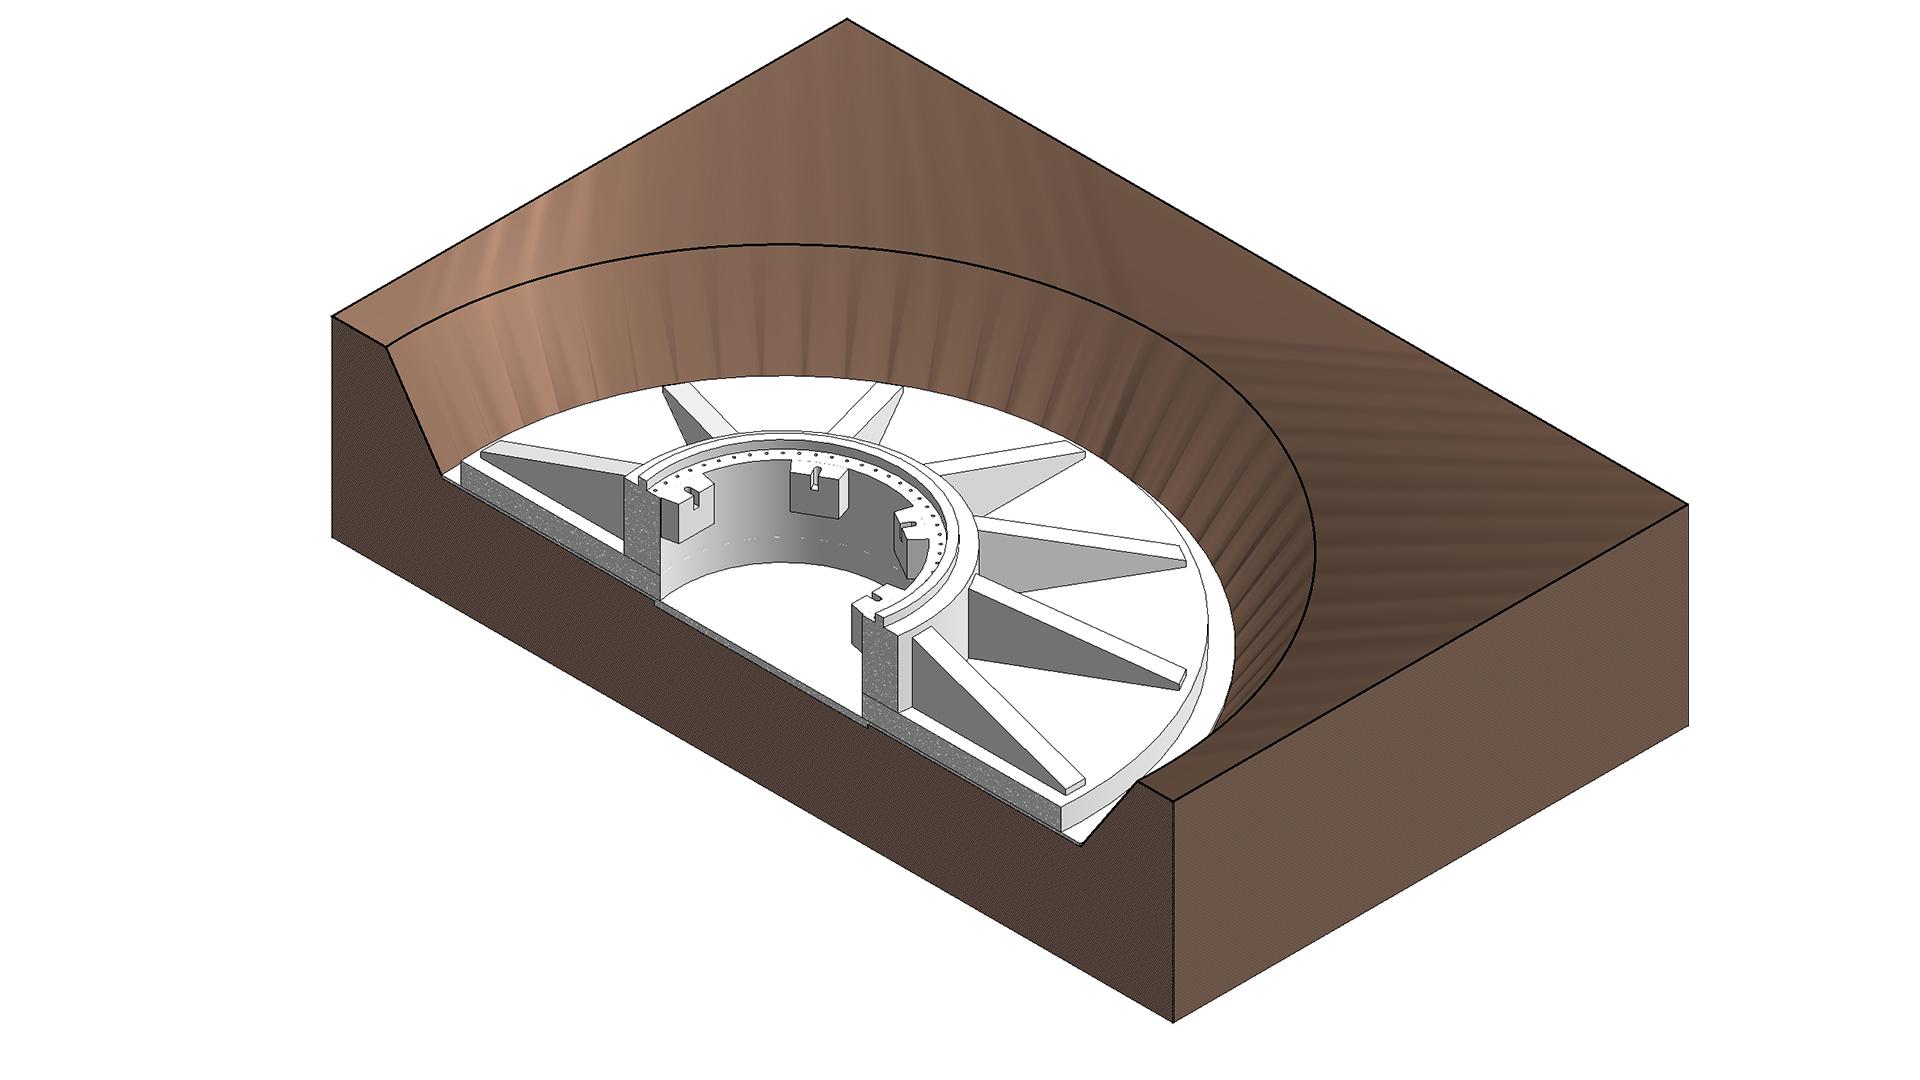 Cimentacion Aerogeneradores A13-presentacion4